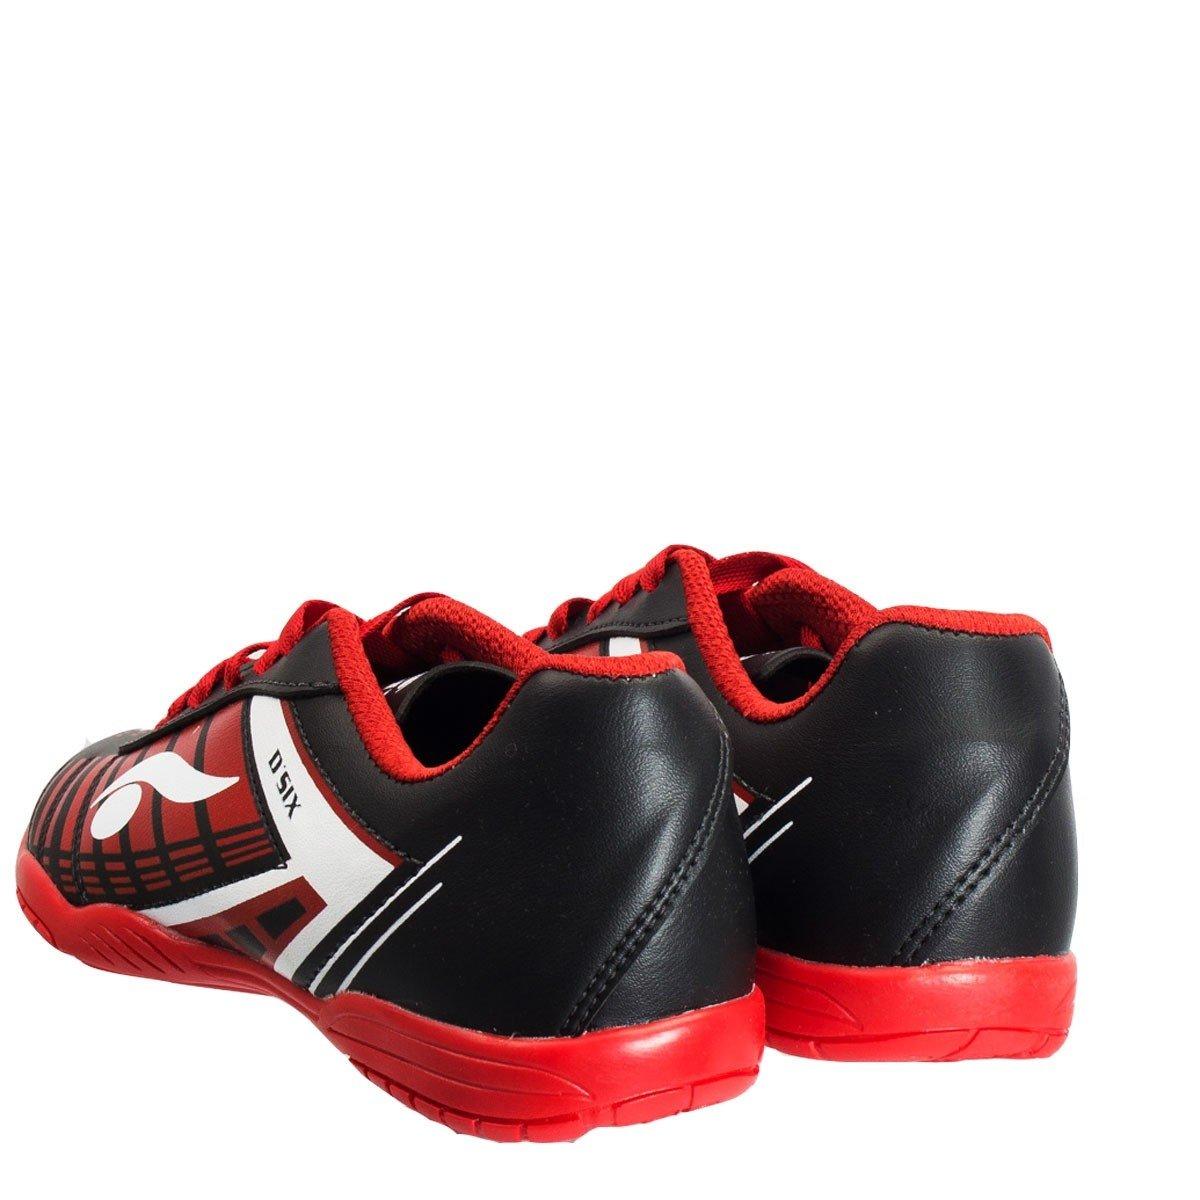 Chuteira Futsal Infantil D six Indoor 6202 - Compre Agora  d8d55fefd8066